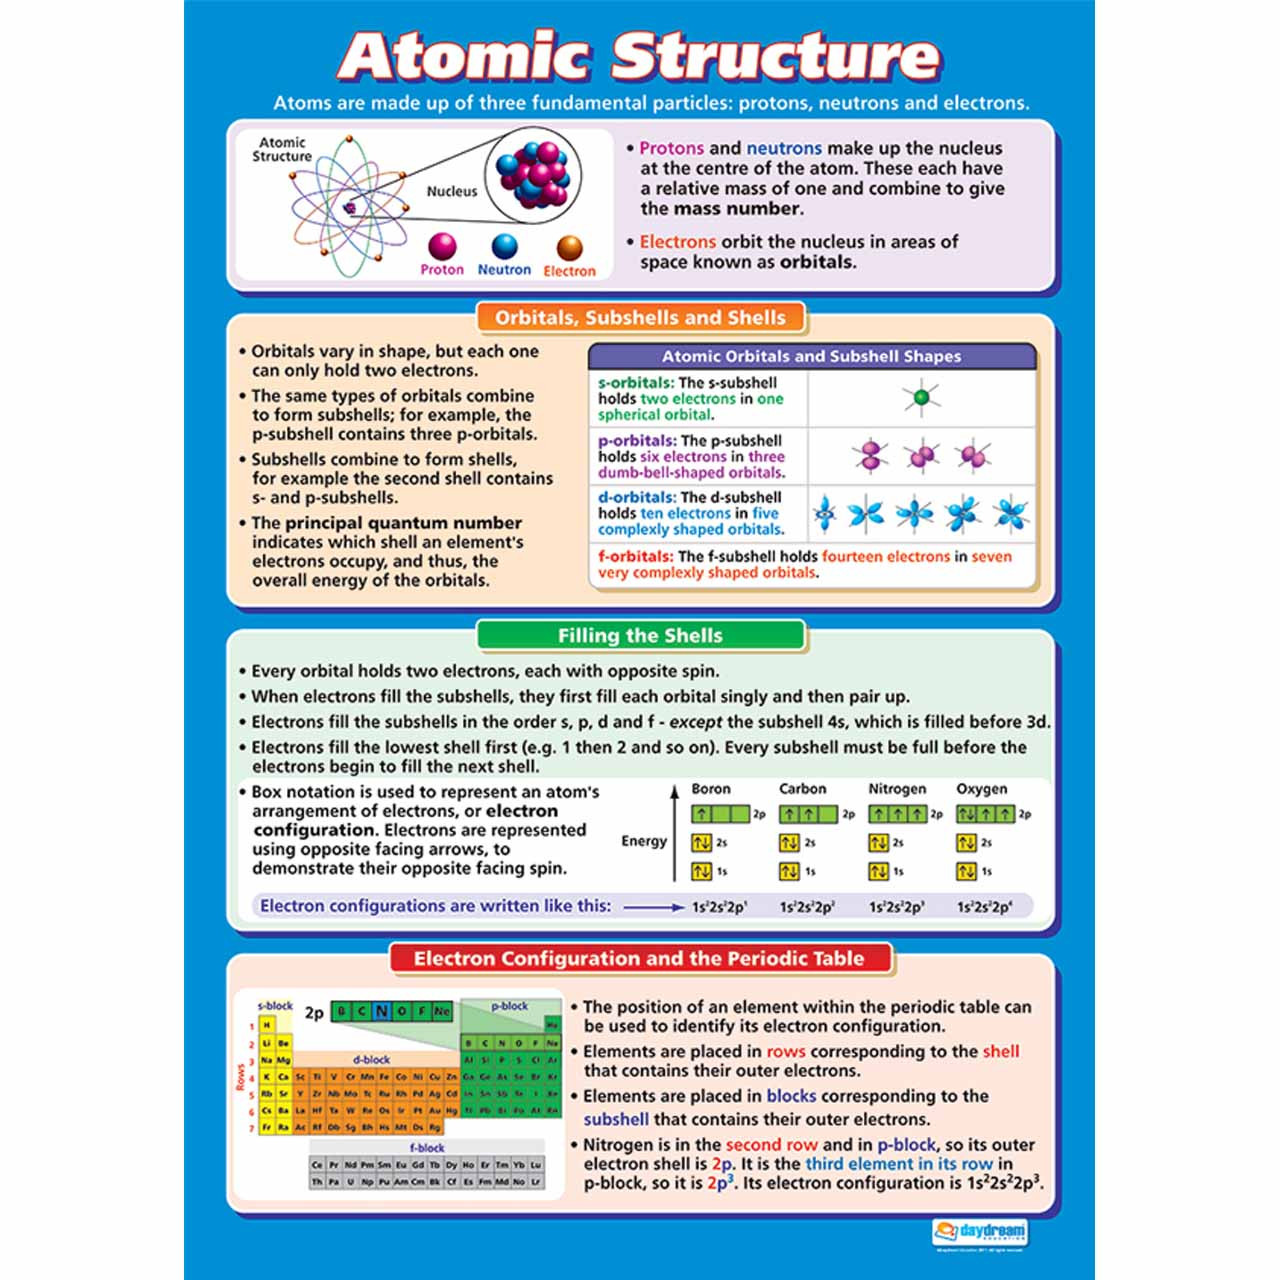 Atomic Structure Laminated